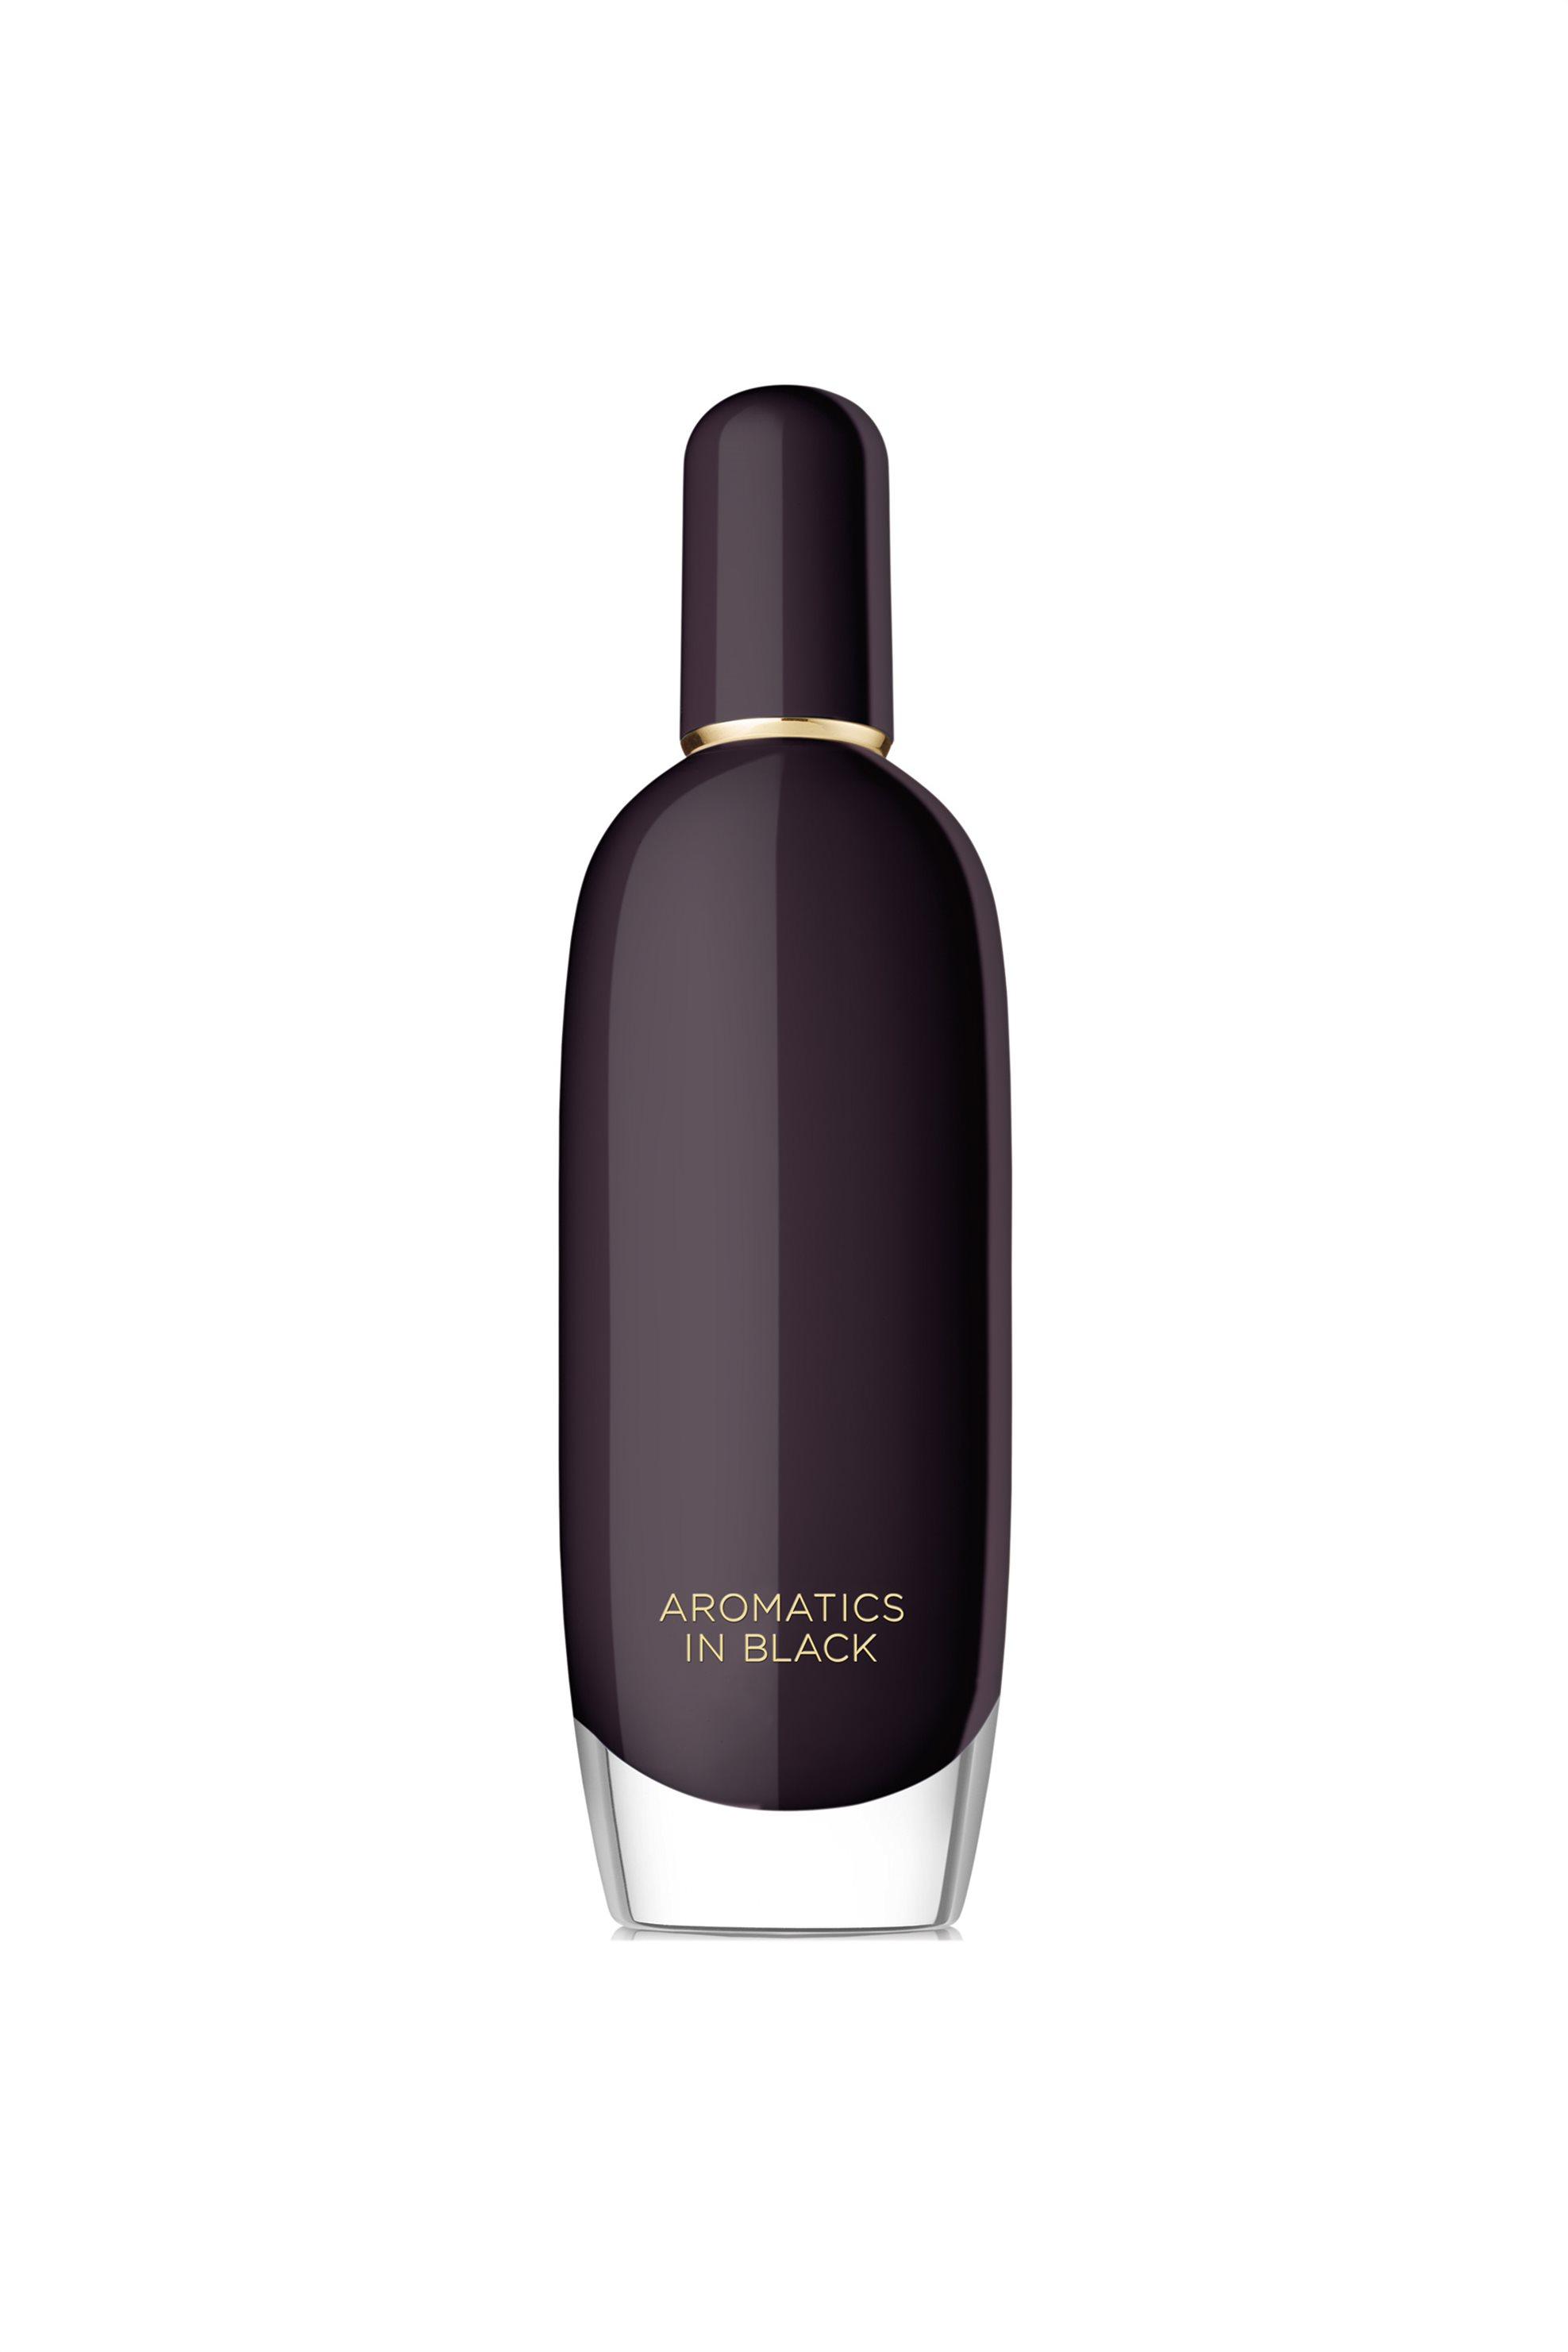 Clinique Aromatics in Black EdP 100 ml - ZJ4P010000 ομορφια   καλλυντικα επιλεκτικησ   αρώματα   γυναικεία αρώματα   eau de parfum